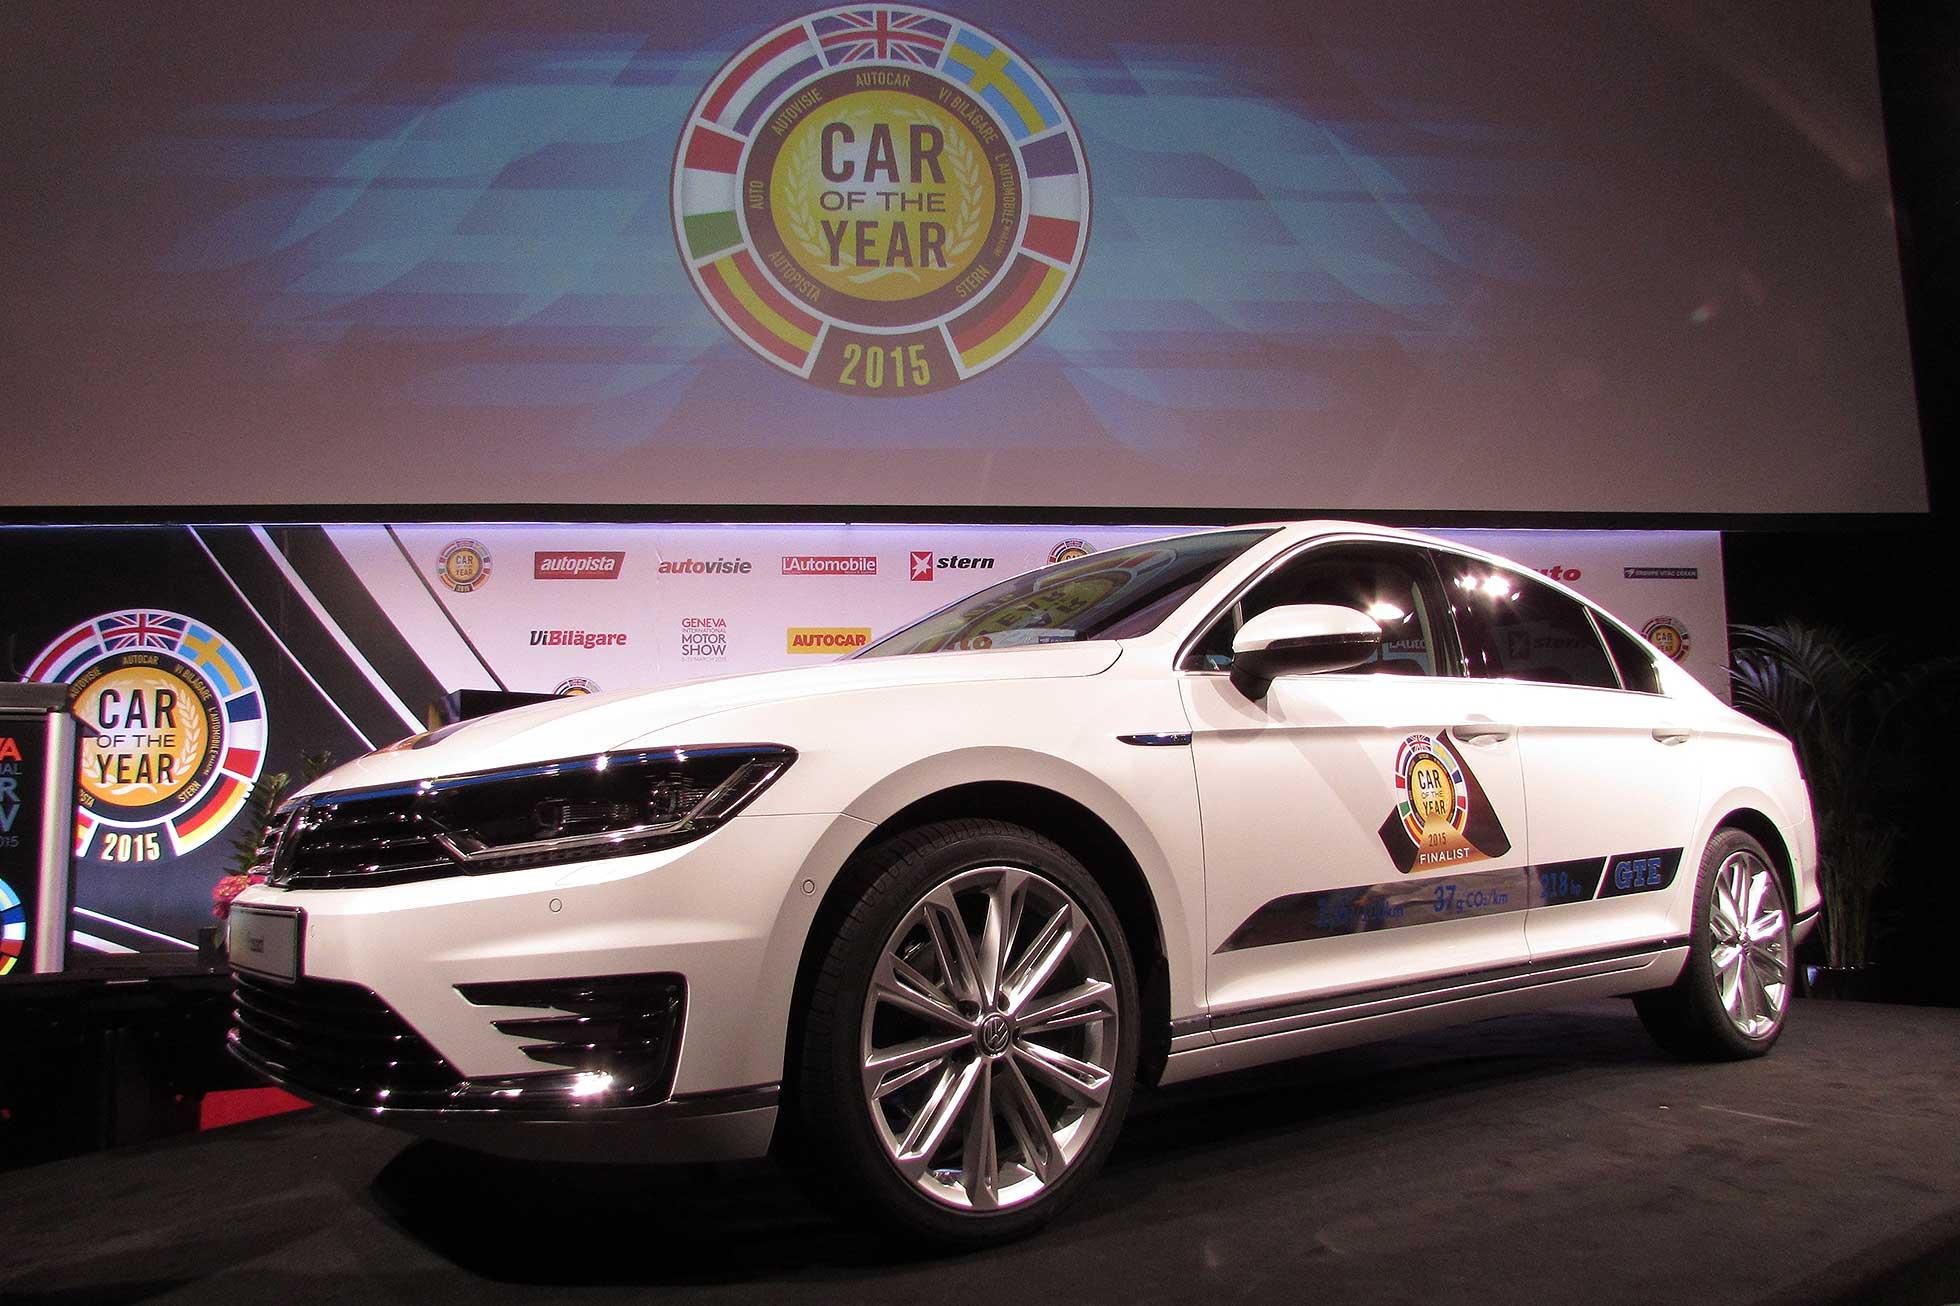 Year 2015 cars